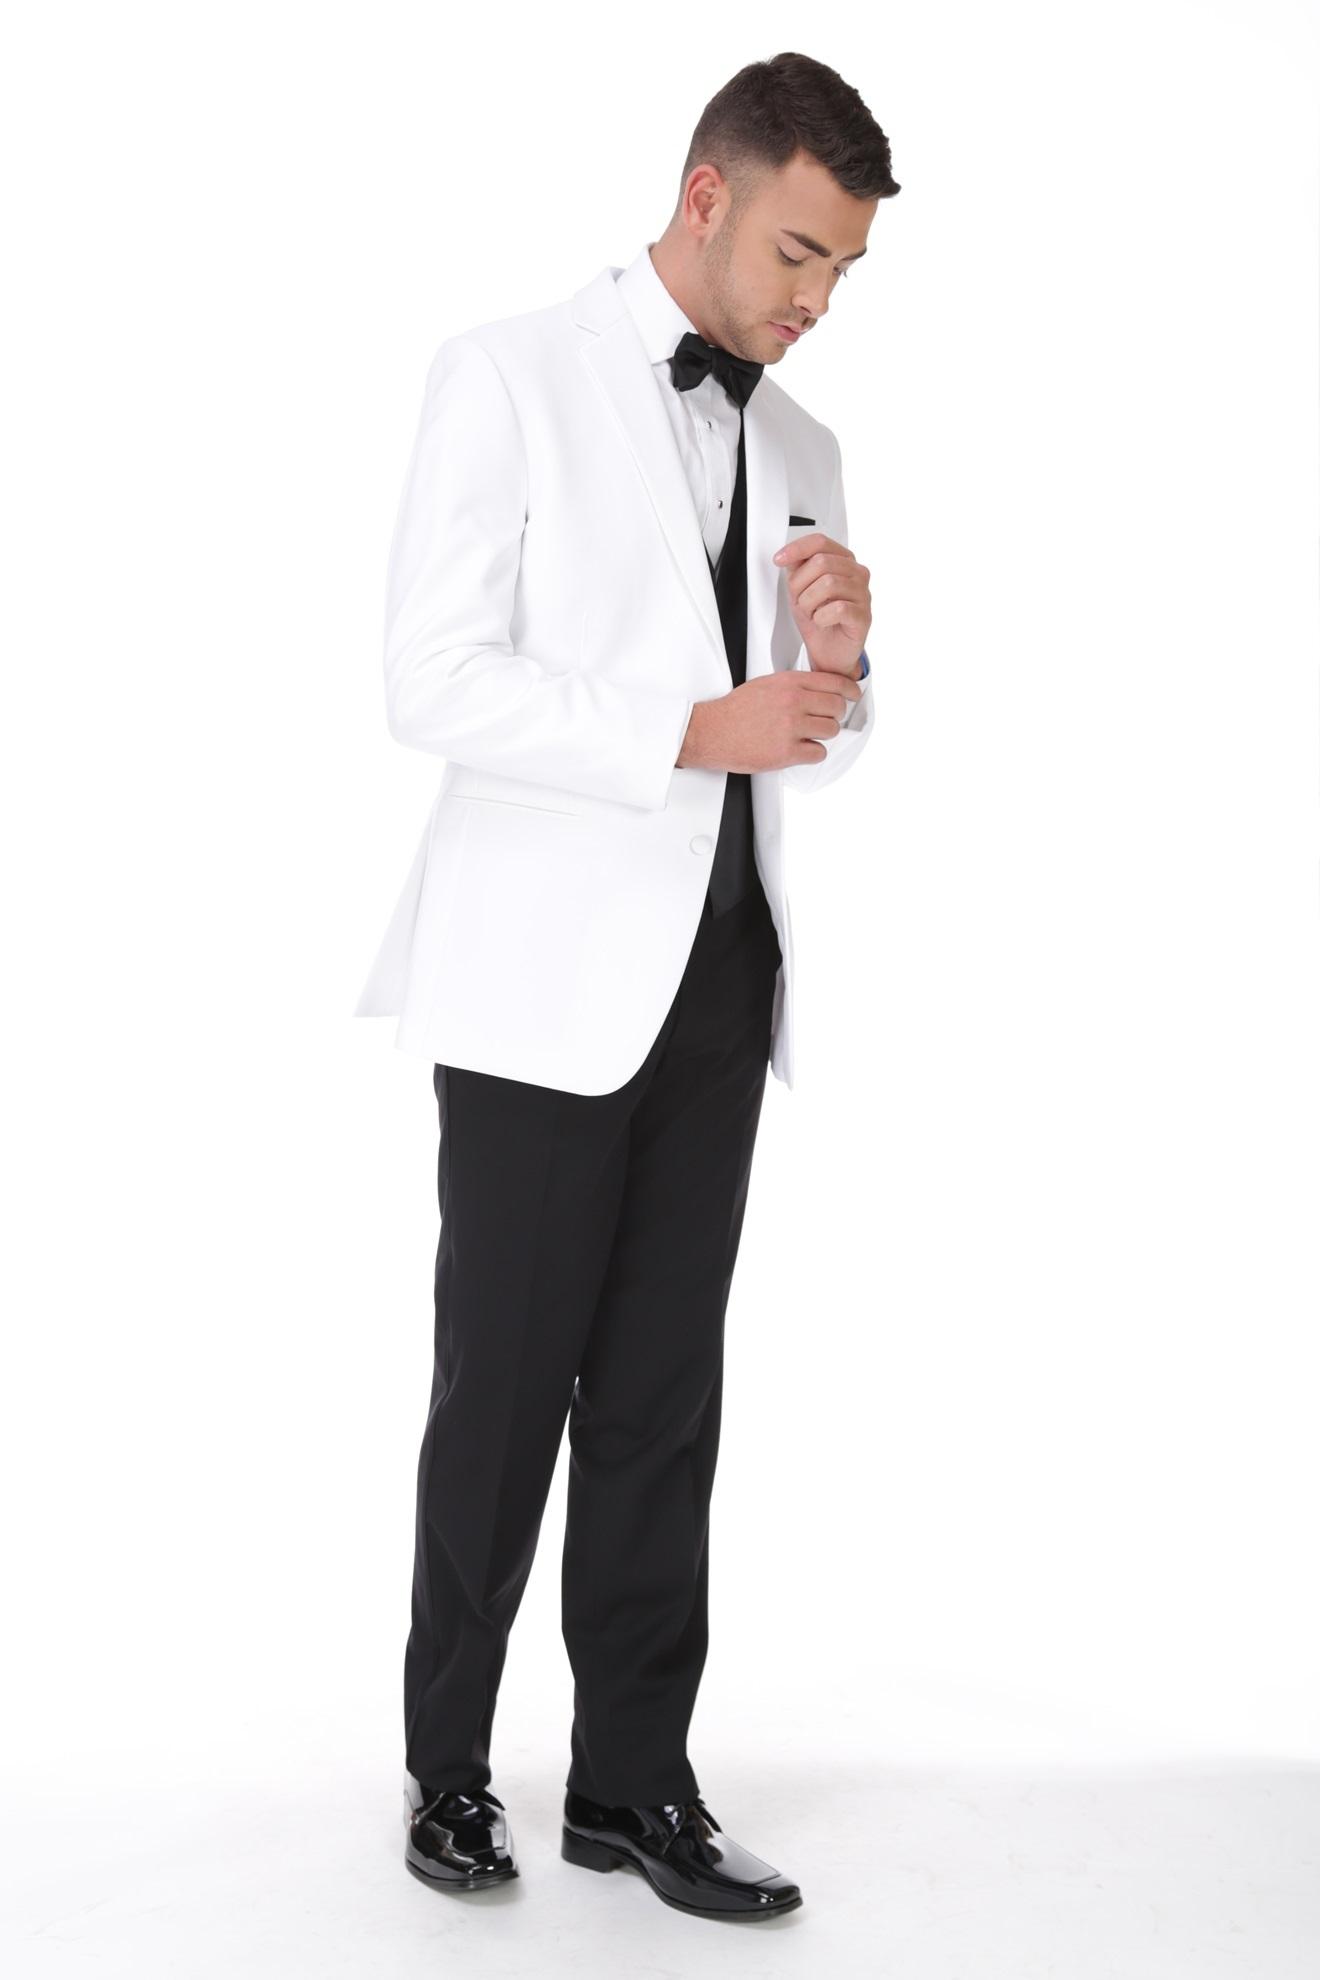 Milroy's Tuxedos - White Jean Yves Fitted Essentials Tuxedo